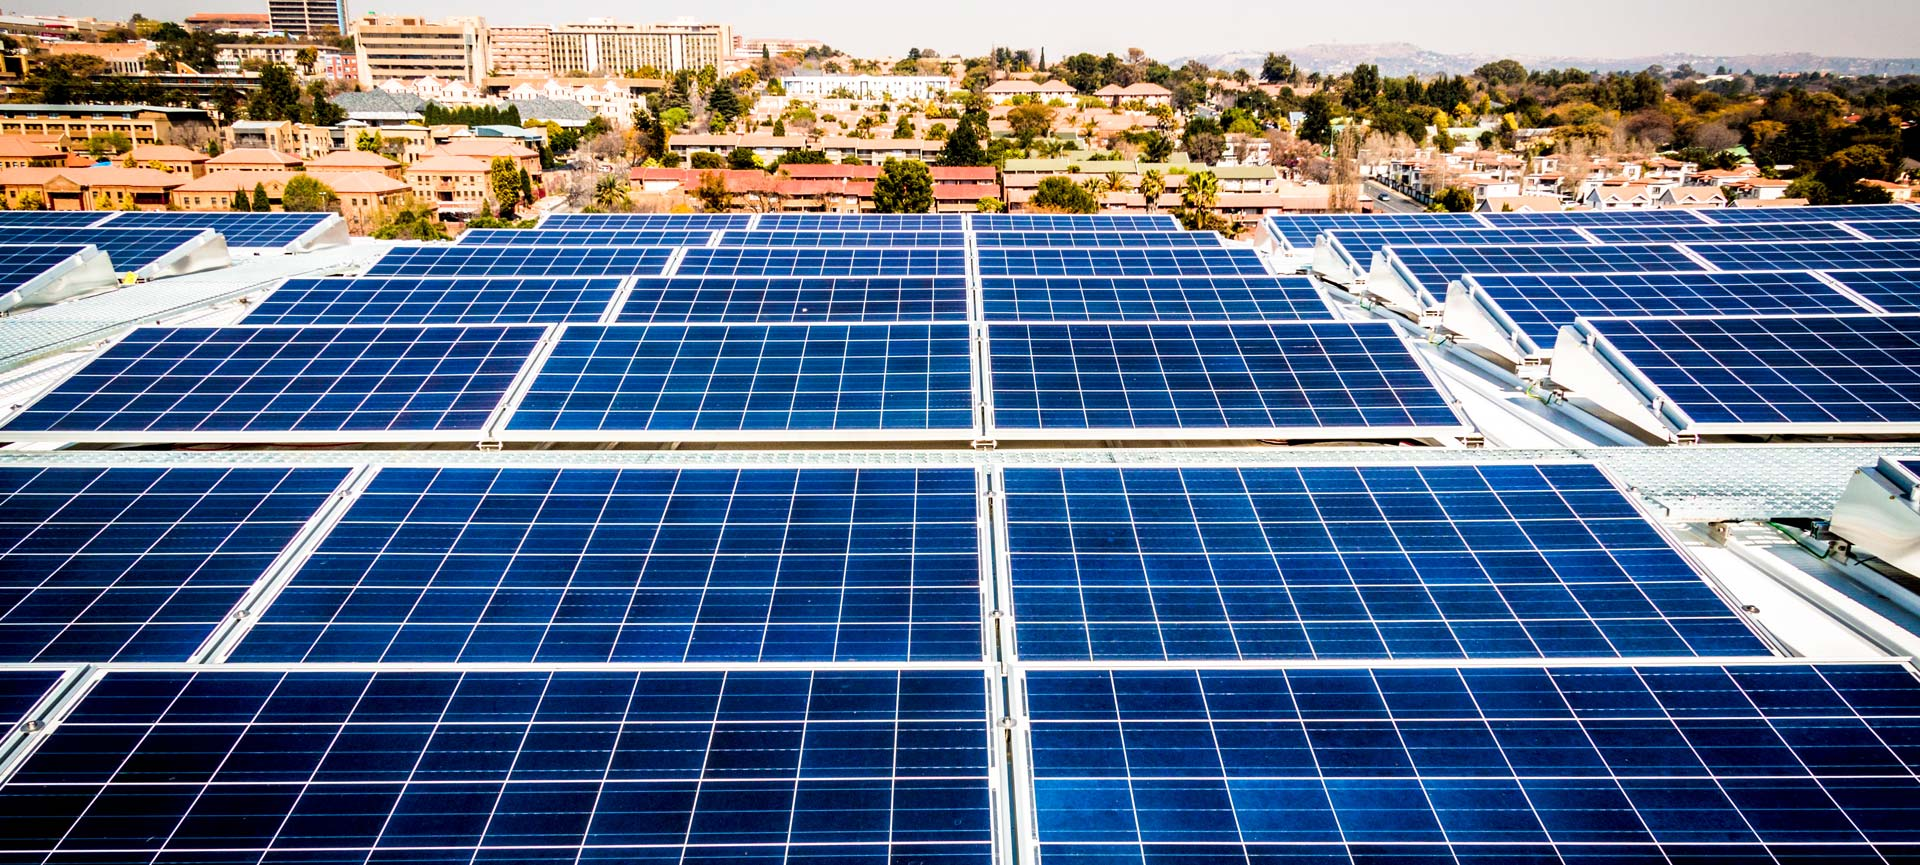 Award winning solar power company